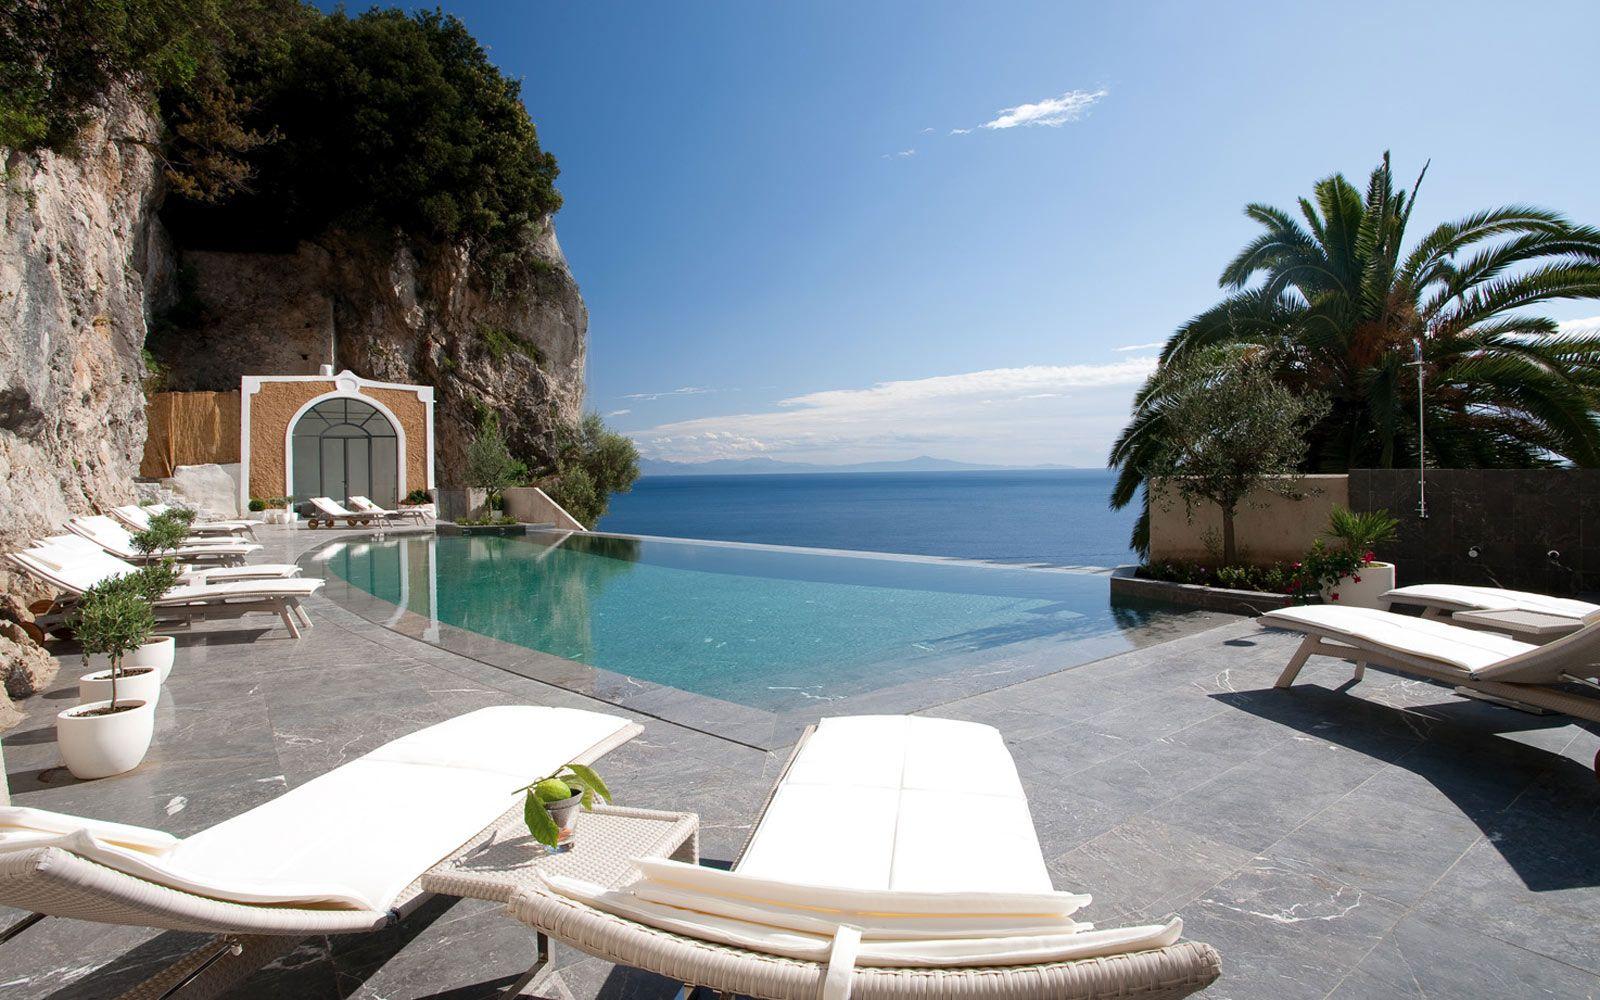 Grand Hotel Convento - Amalfi